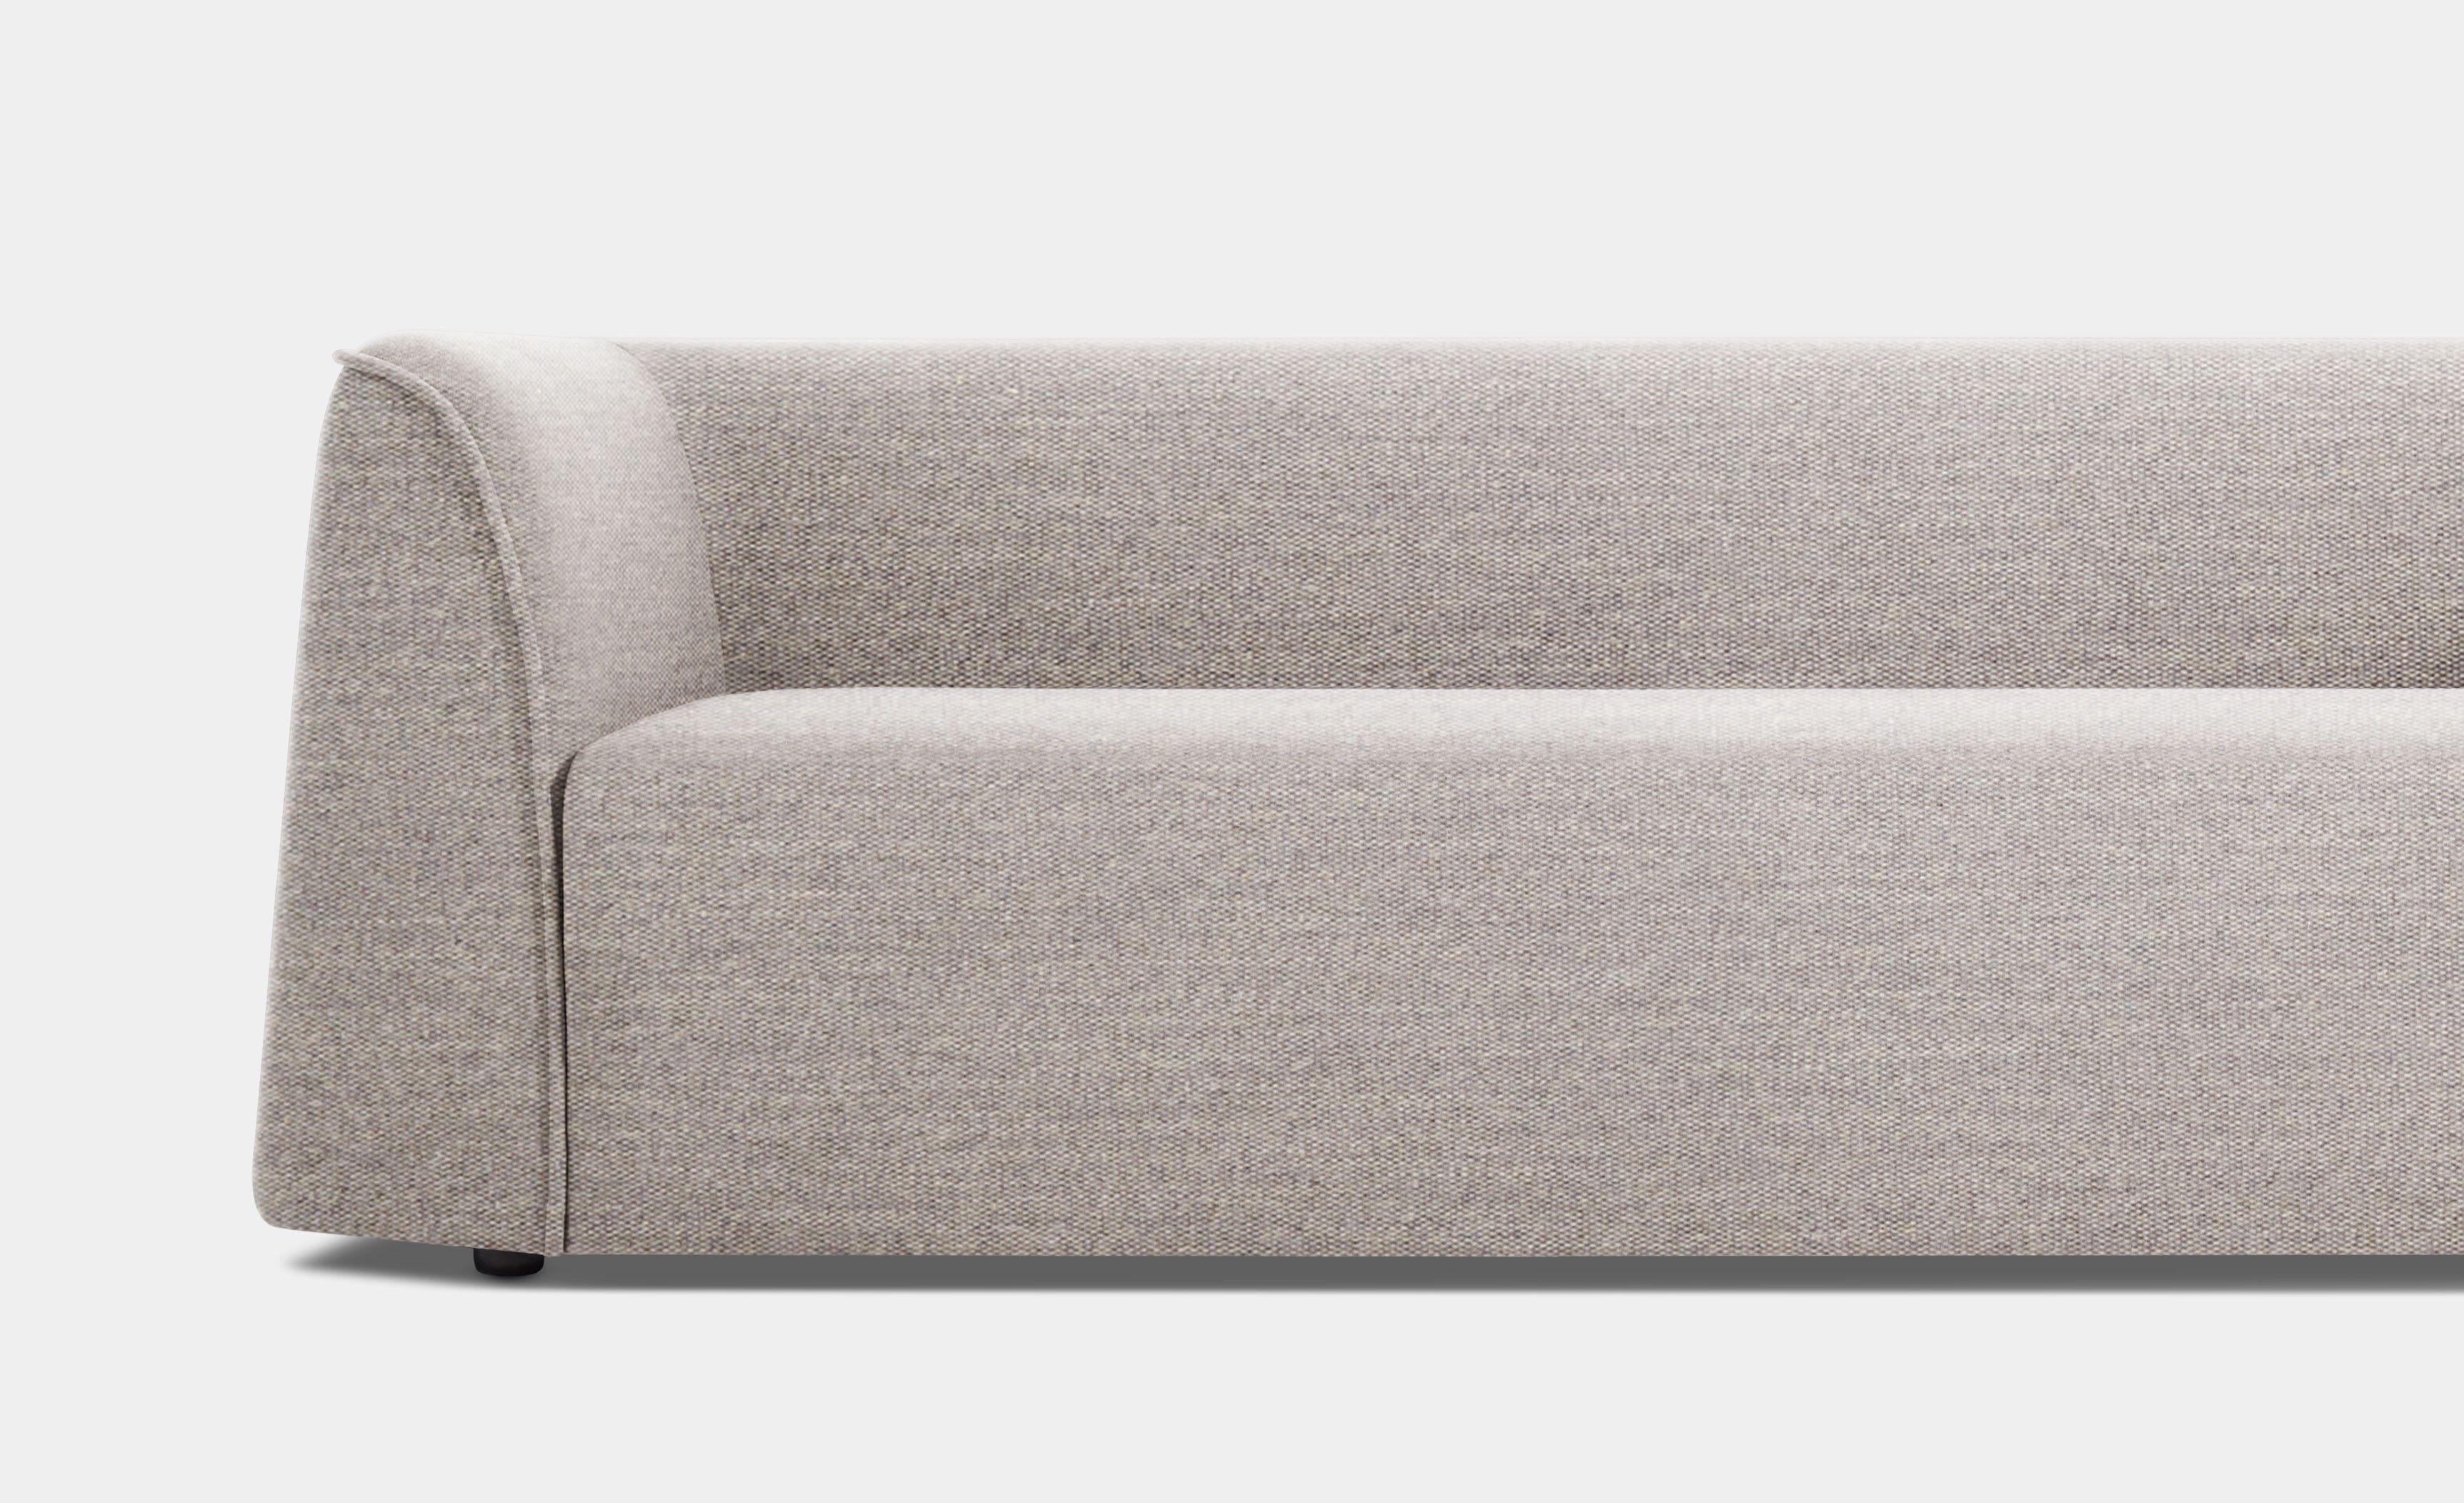 Thataway Sofa by Blu Dot